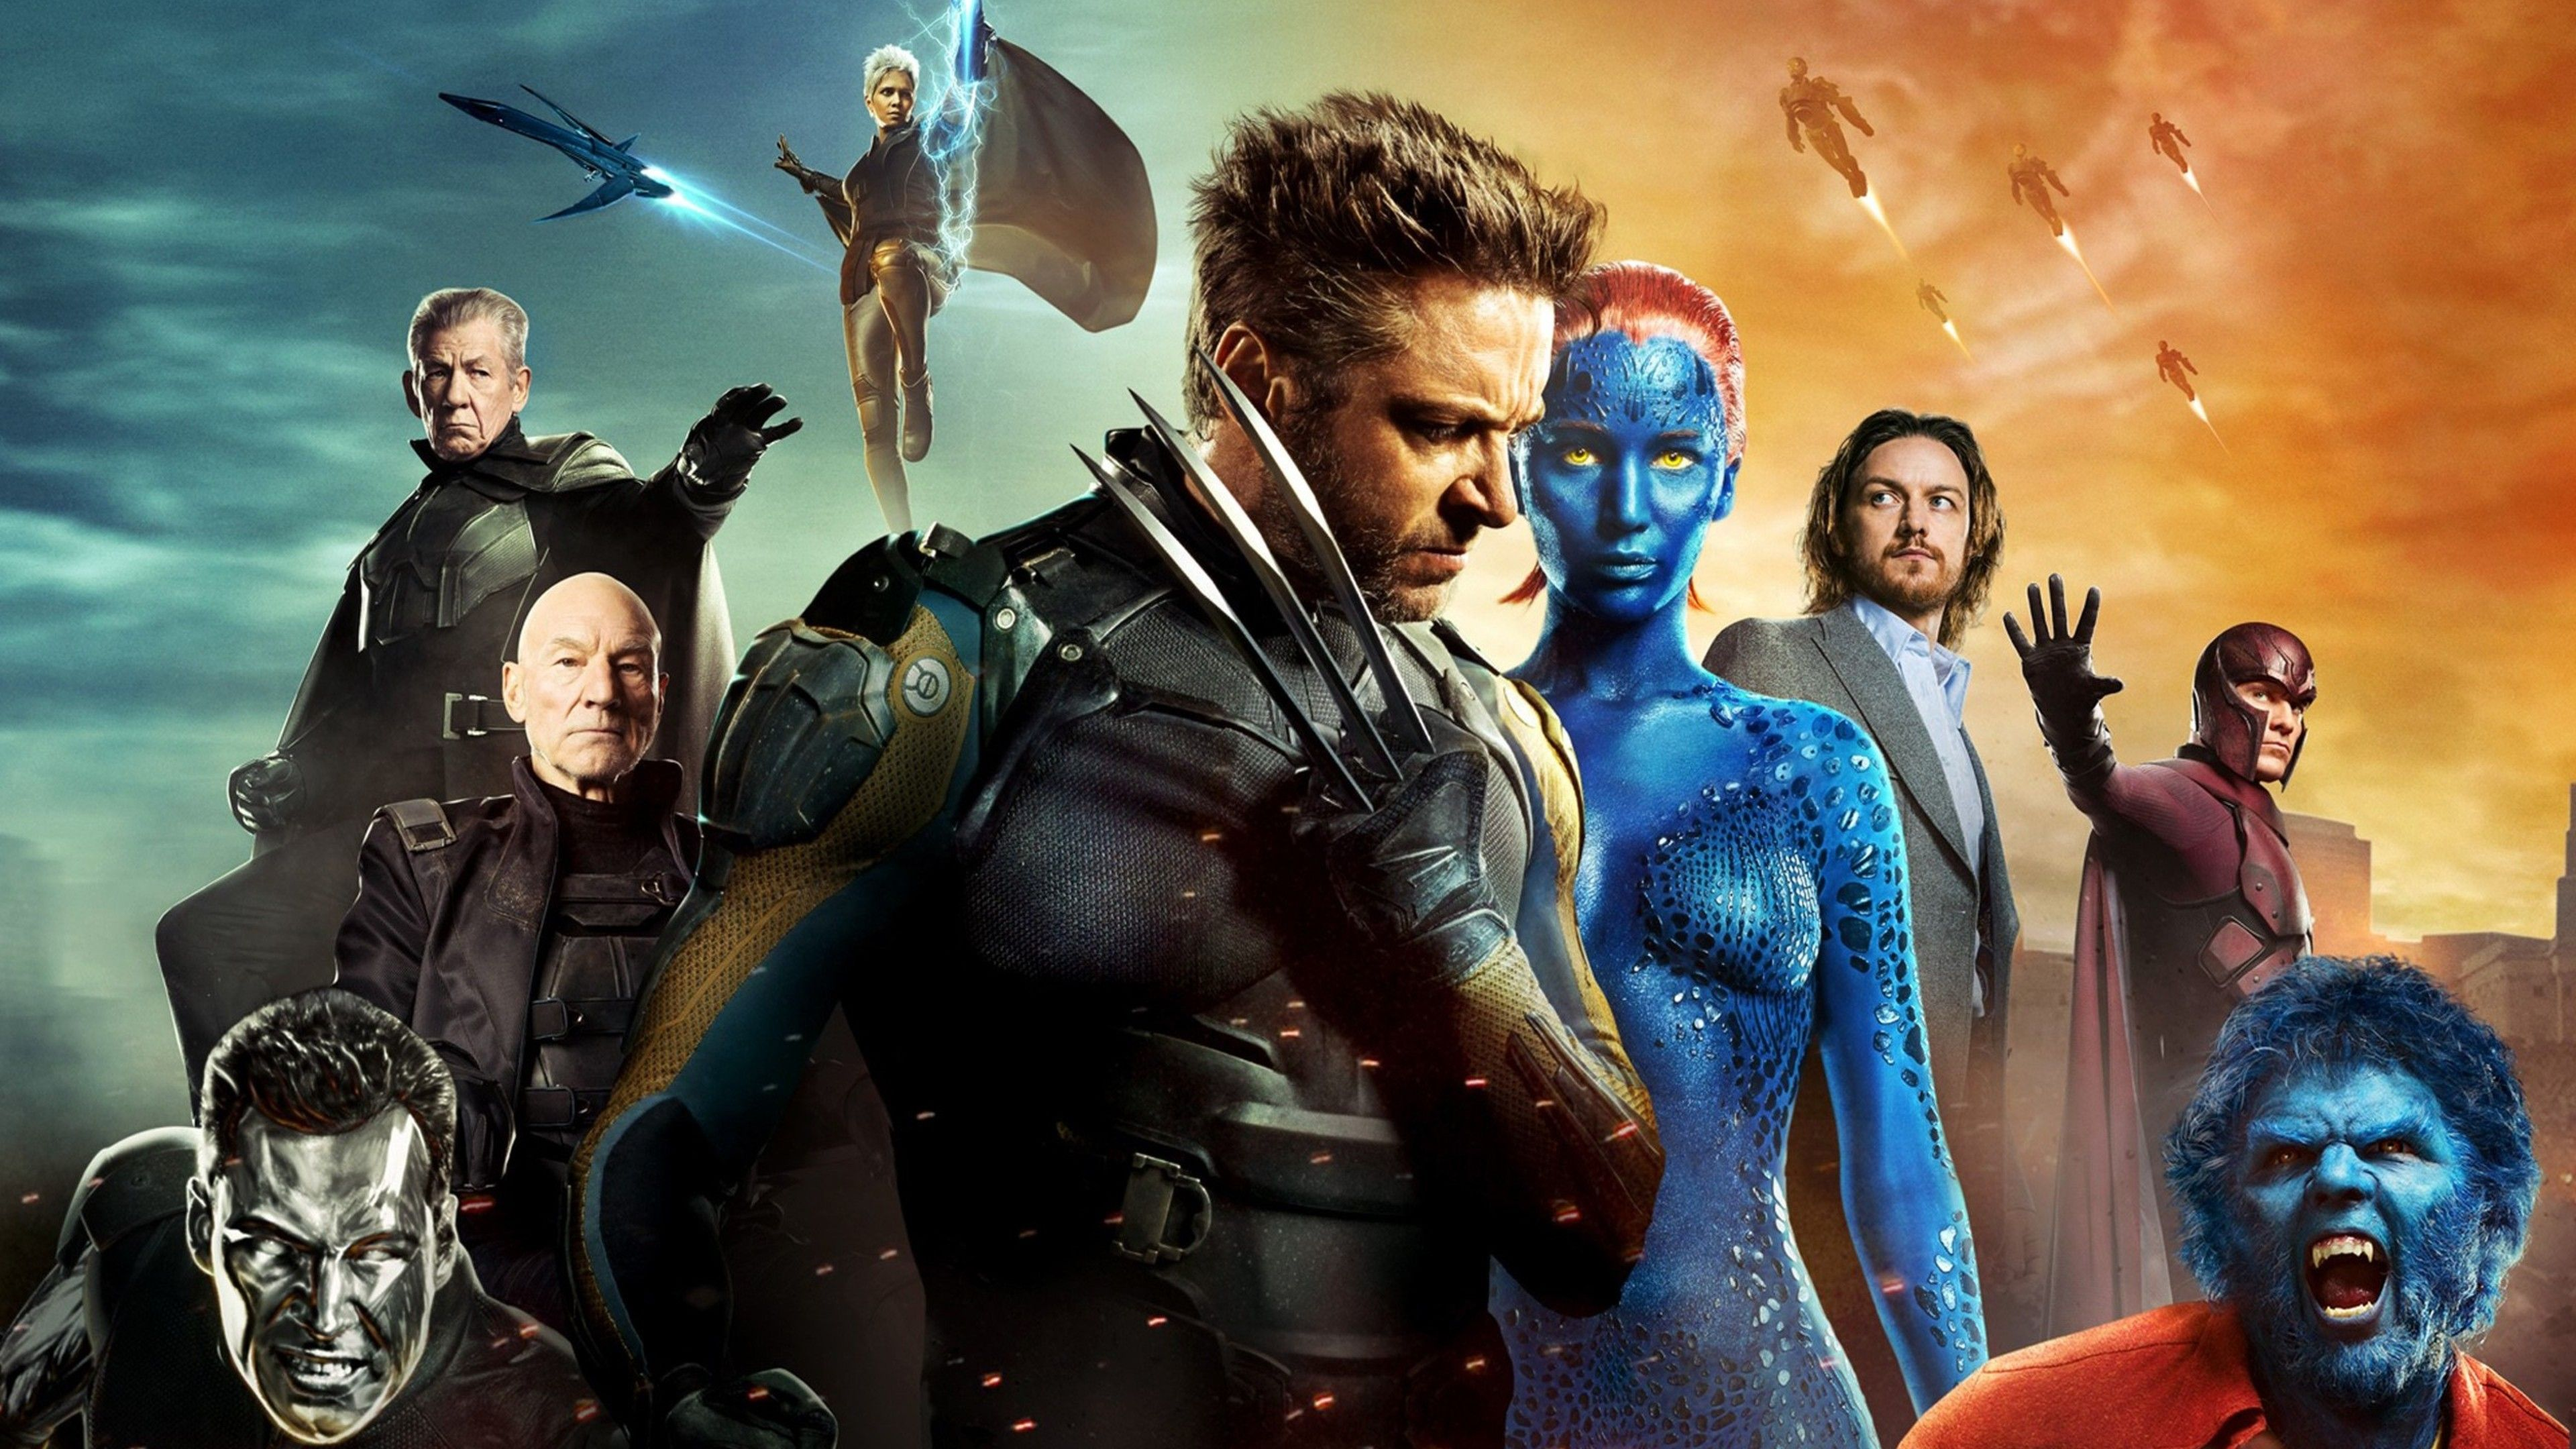 X Men Days Of Future Past Wallpaper 1080p Xq8 Awesomeness